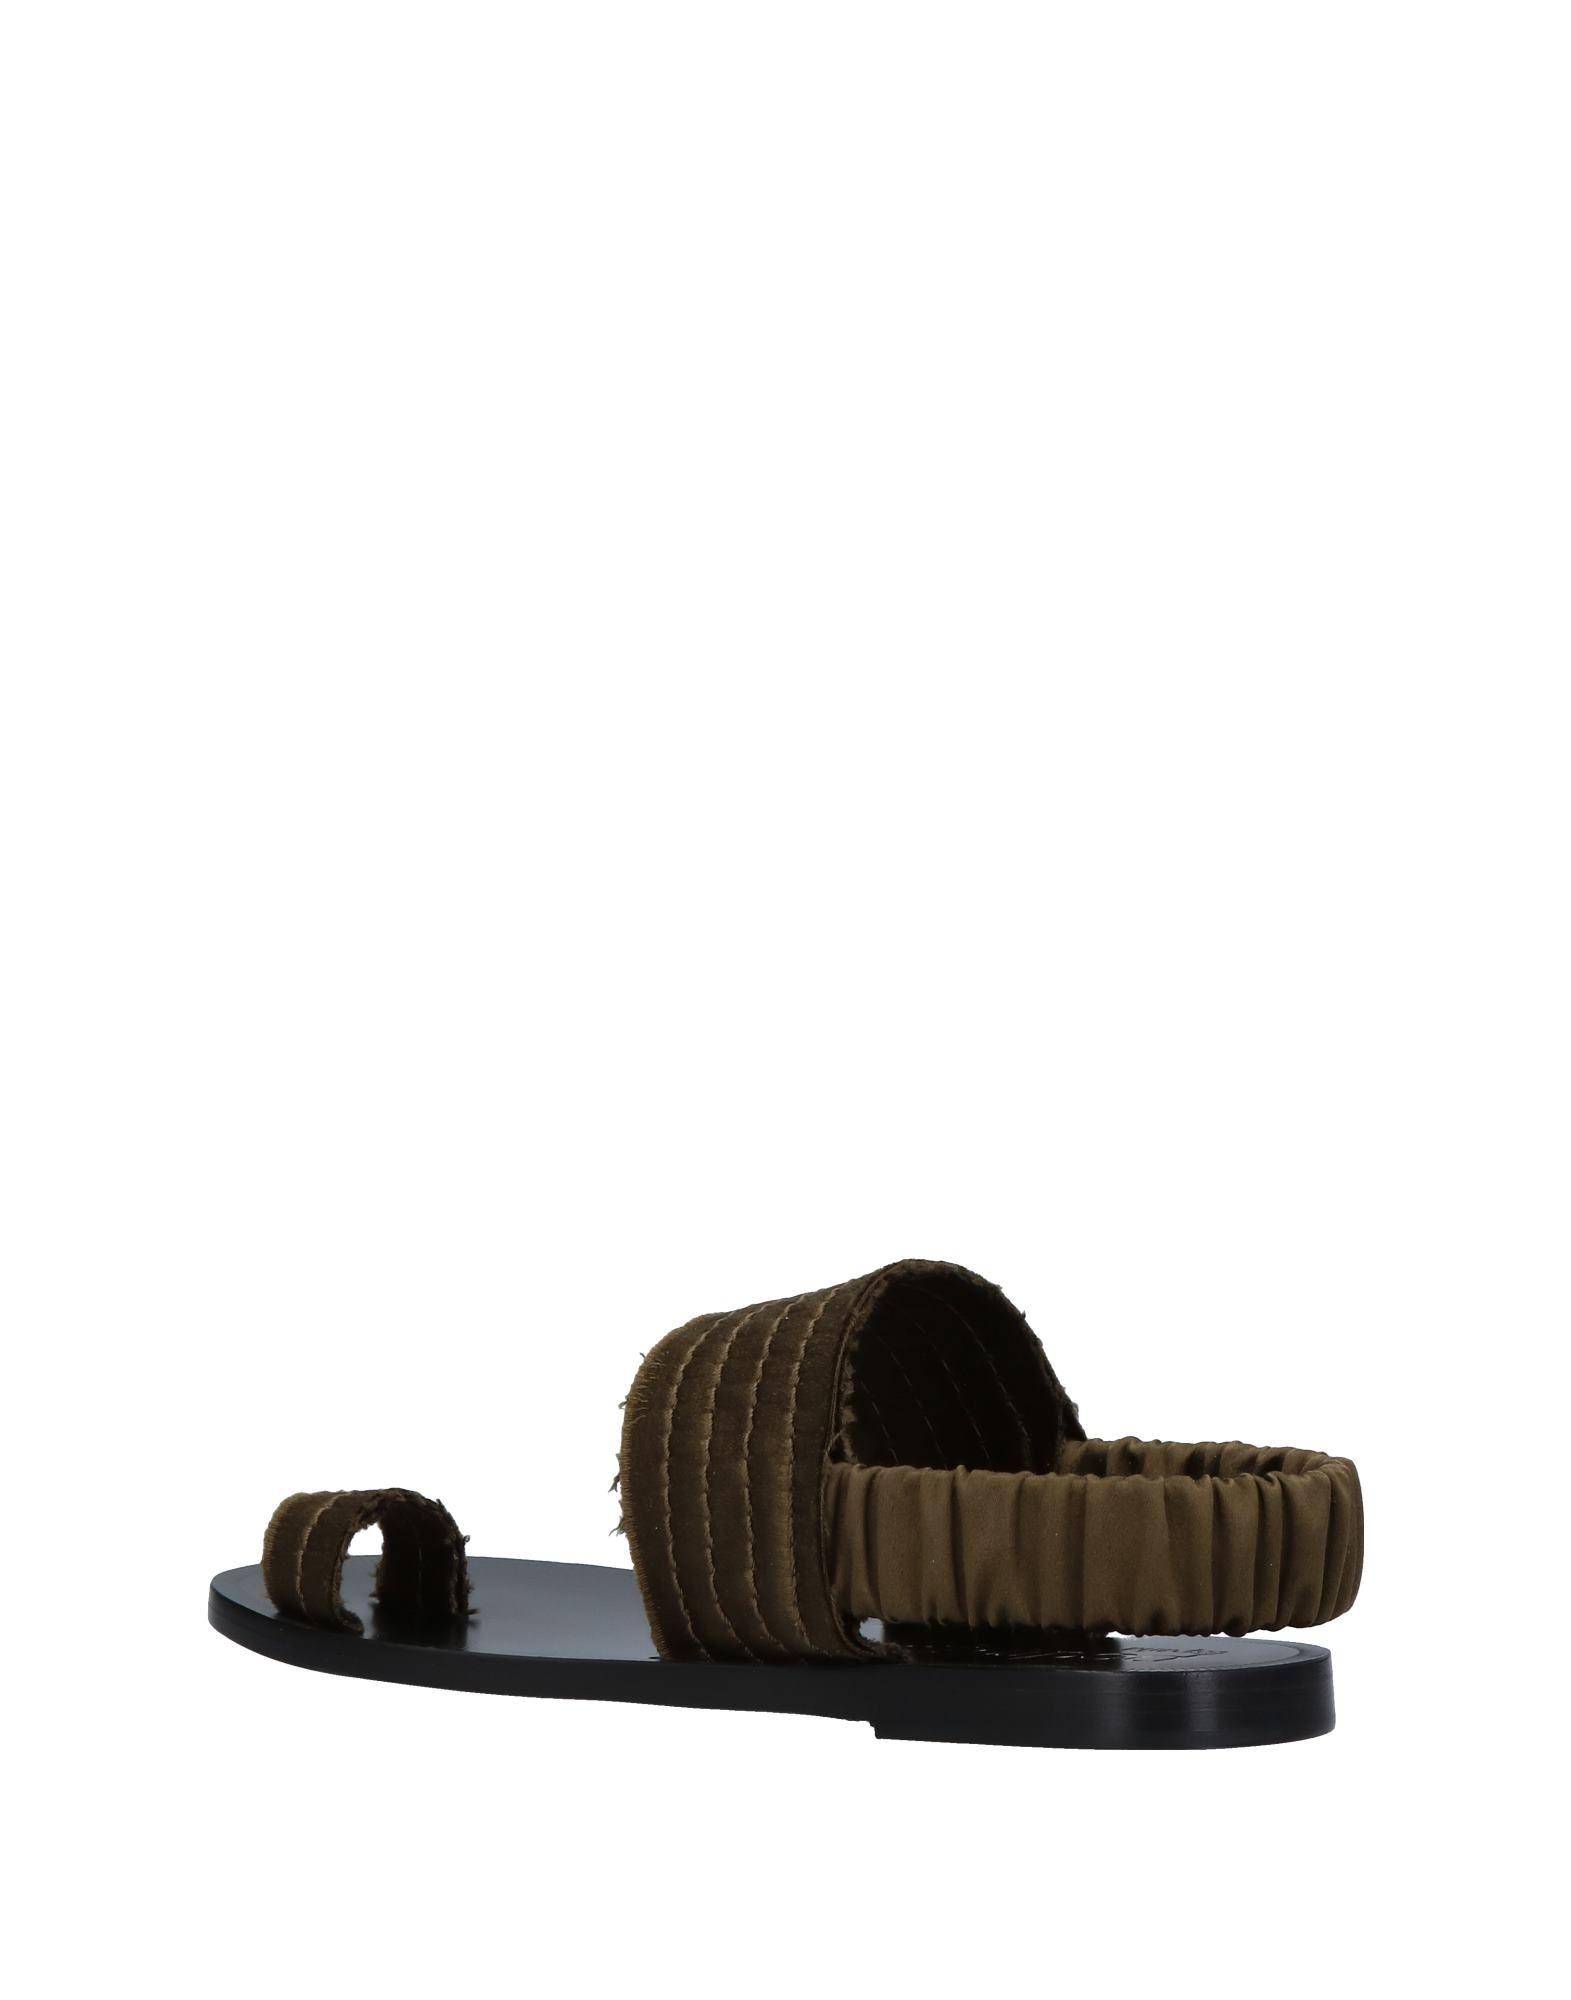 Pedro García Dianetten Damen  11393289OE Gute Qualität beliebte Schuhe